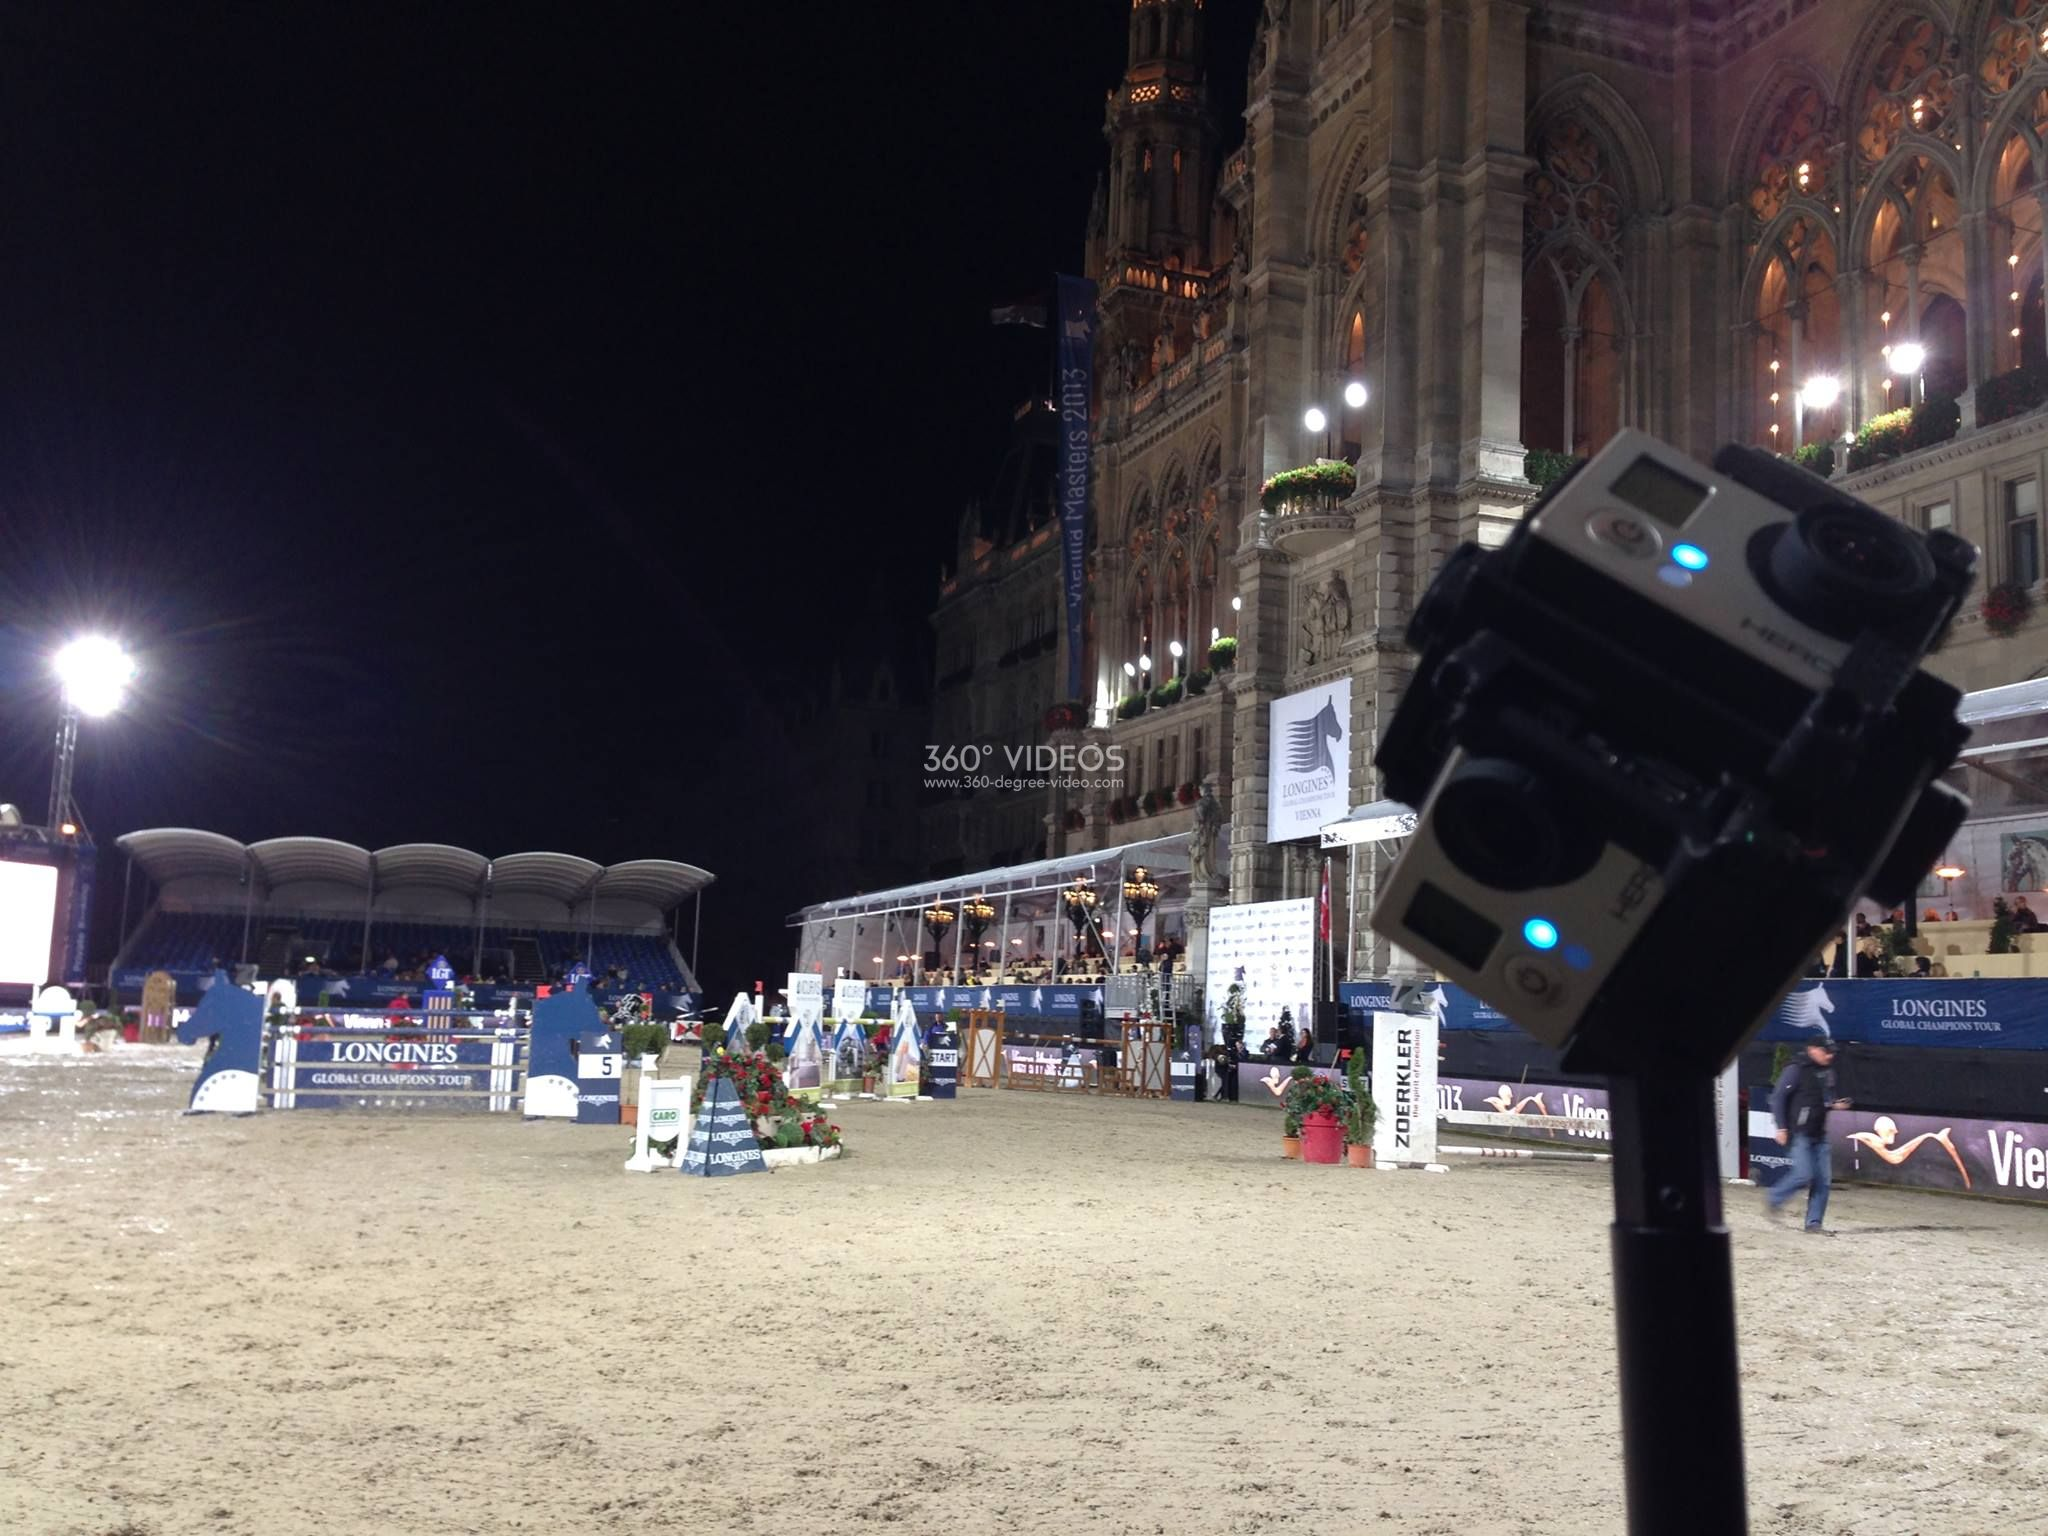 360 degree video camera